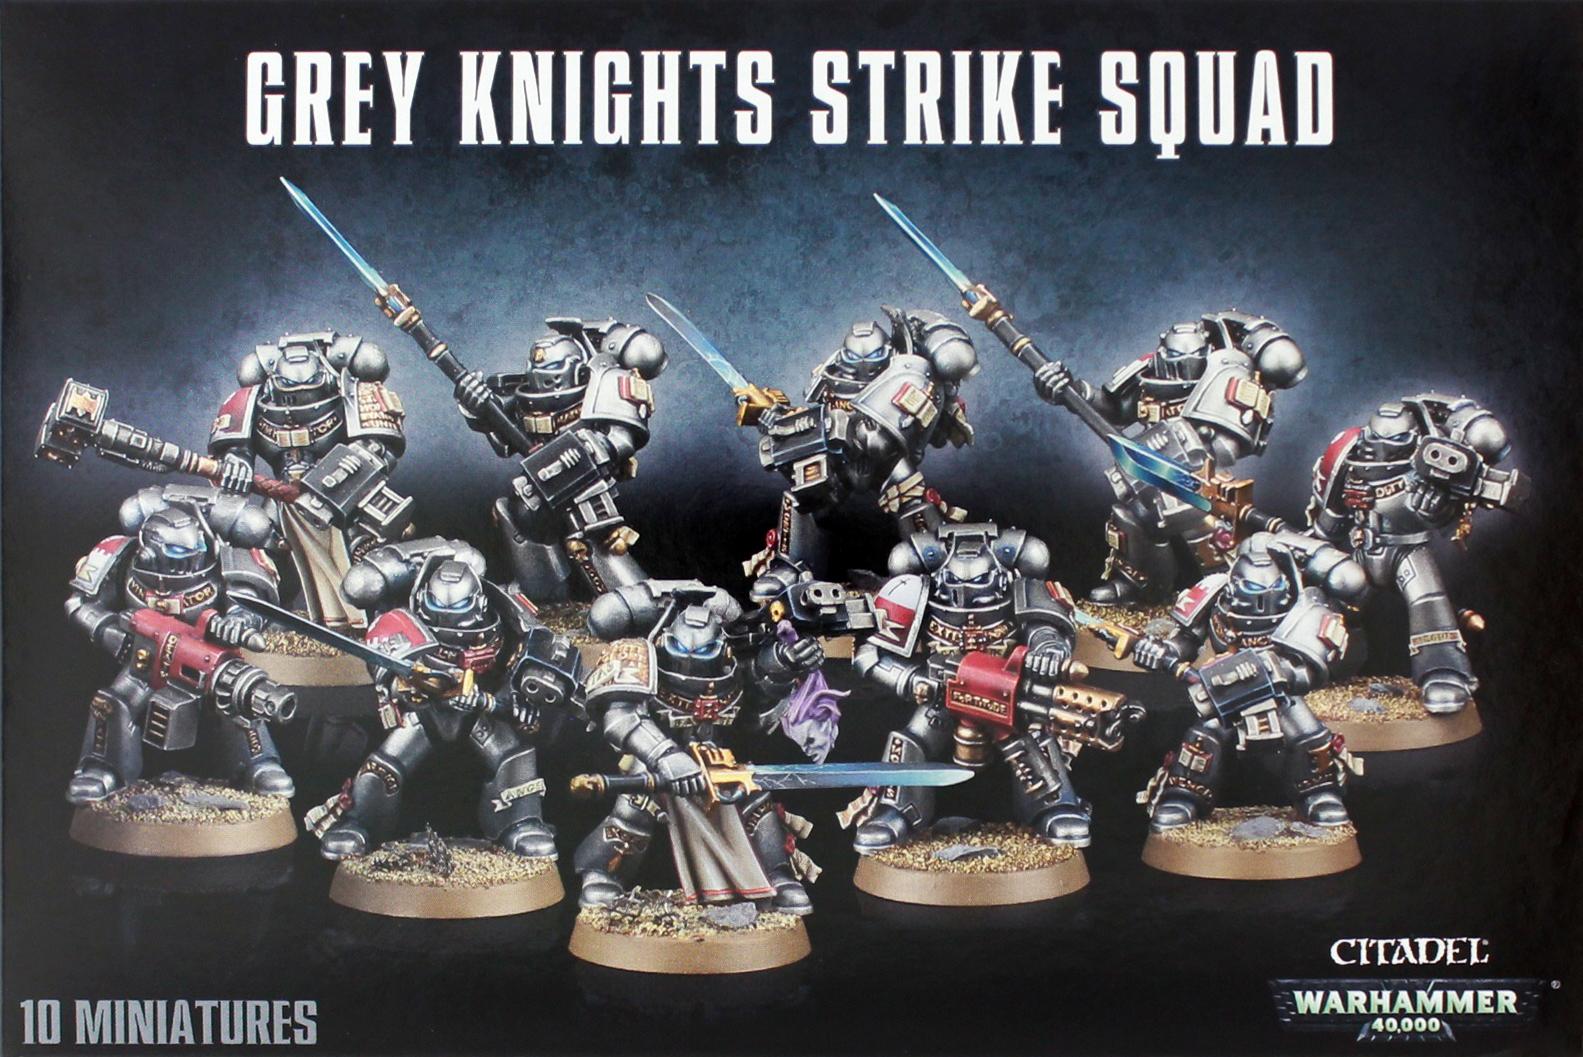 Warhammer 40,000 Grey Knights Strike Squad image